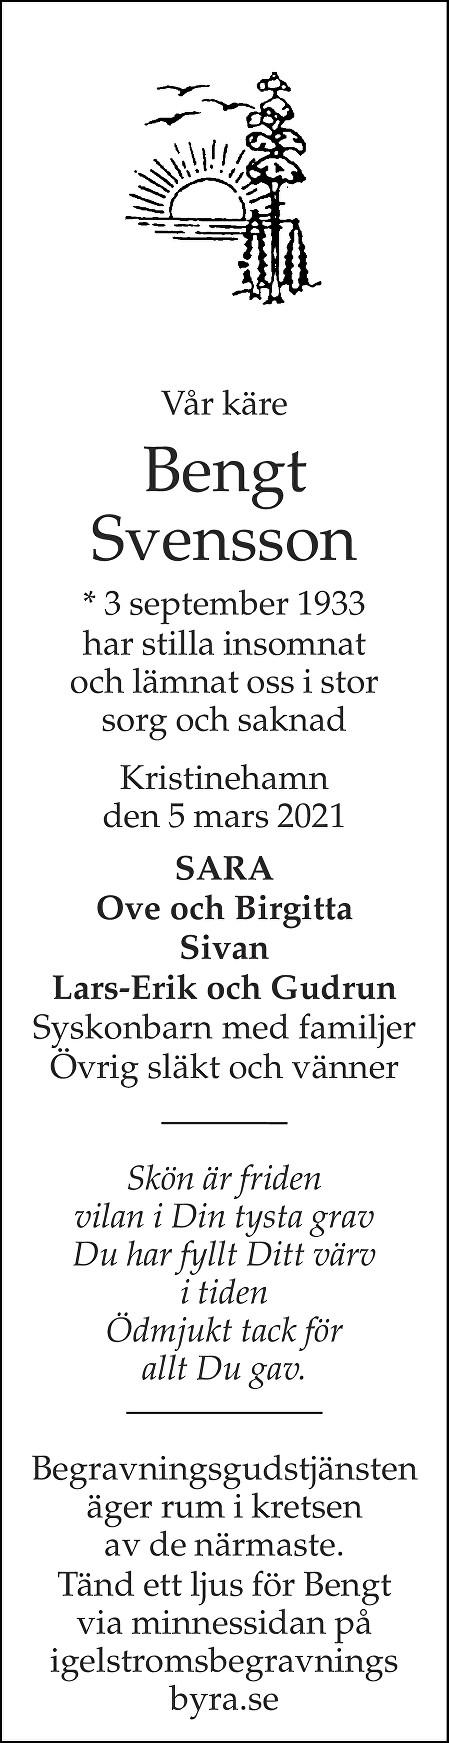 Bengt Svensson Death notice